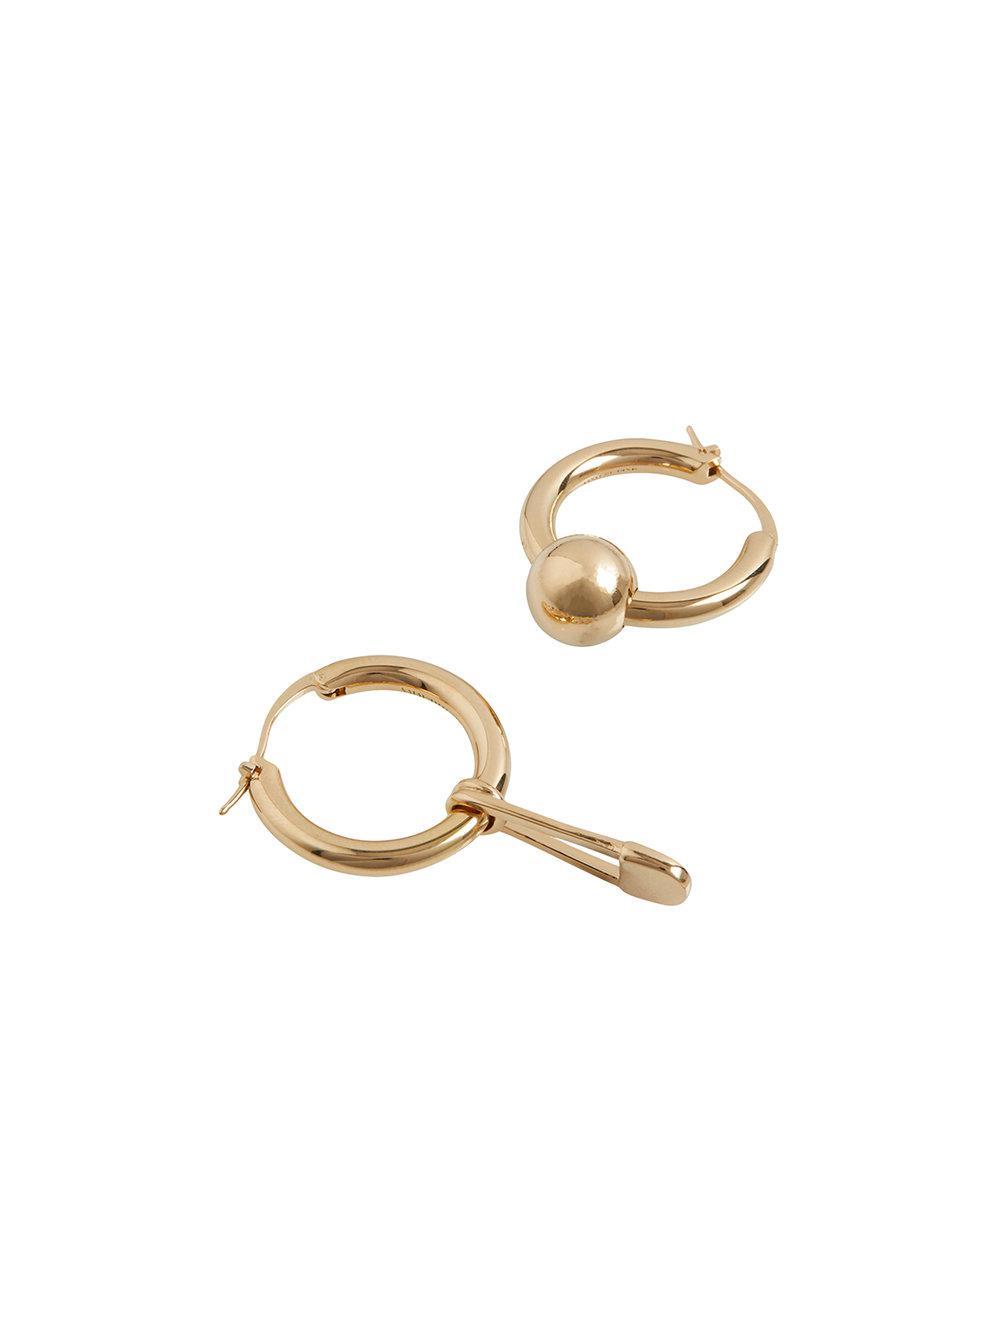 Burberry Kilt Pin earrings - Metallic mYNLvEkJo